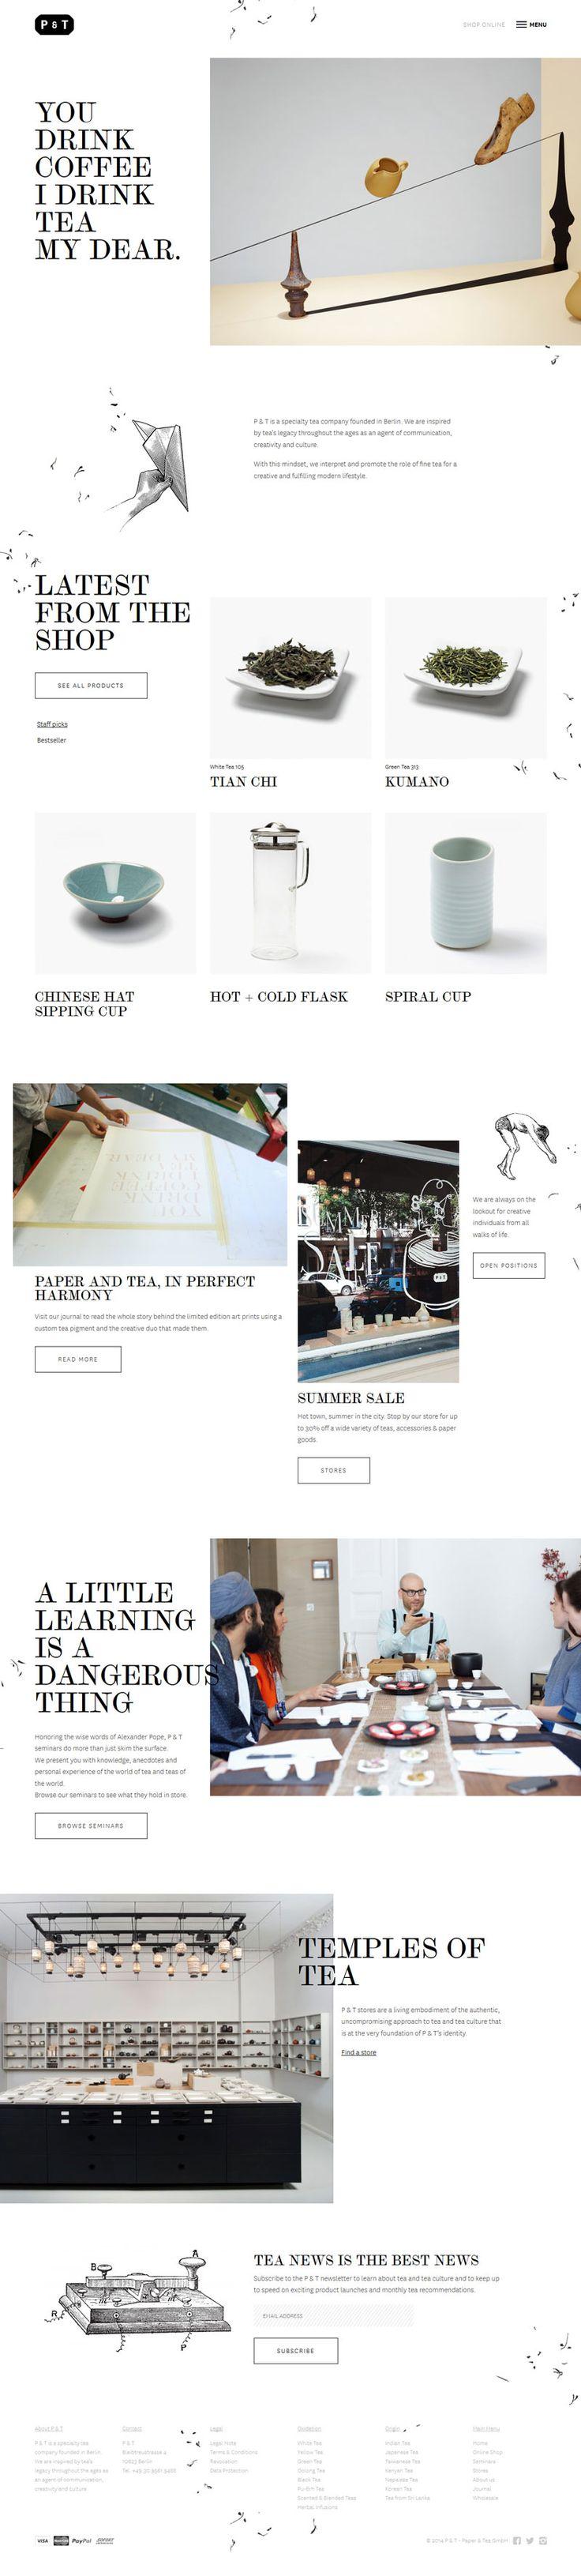 Minimal Design Website; Example; Category: Inspiration; Name Website: P & T; Type Website: Drink good tea; Serif Font; Color: Black and White.